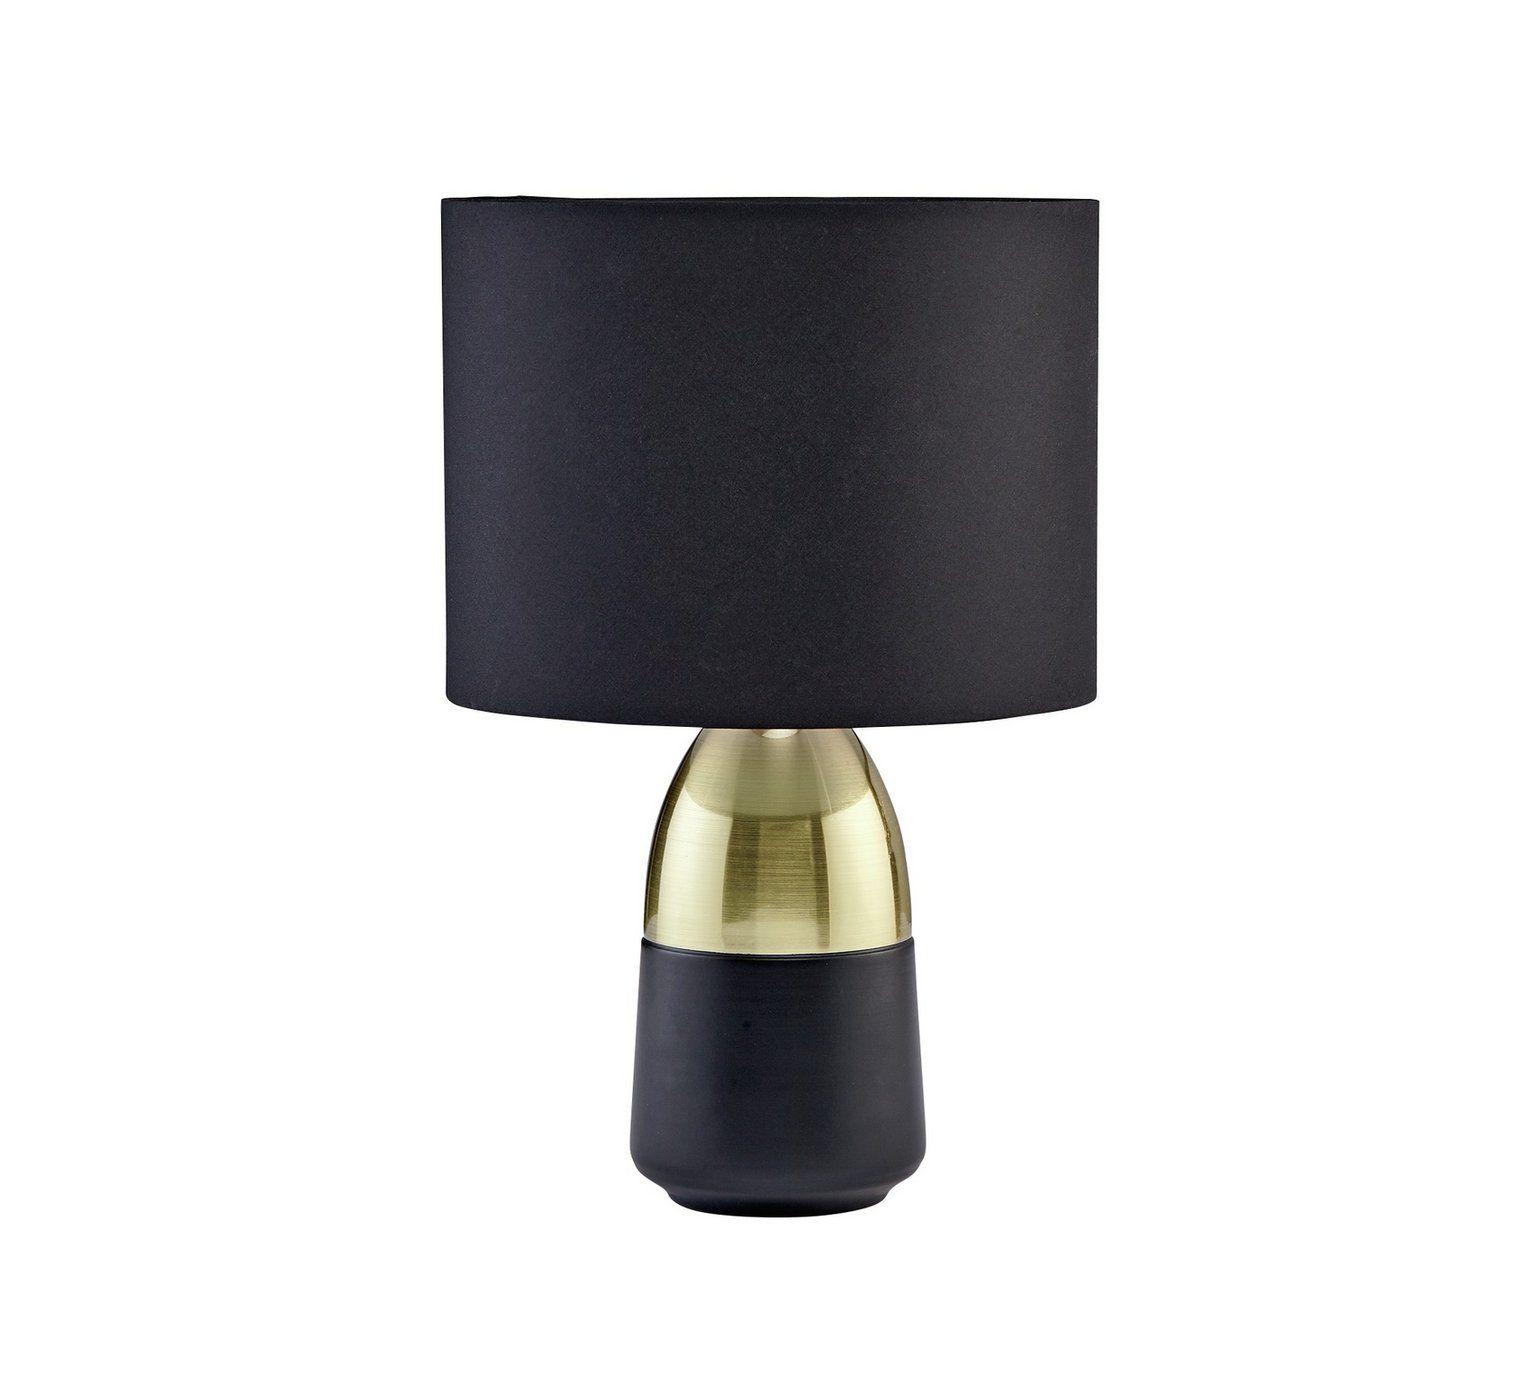 Copper Bedside Table Lamp